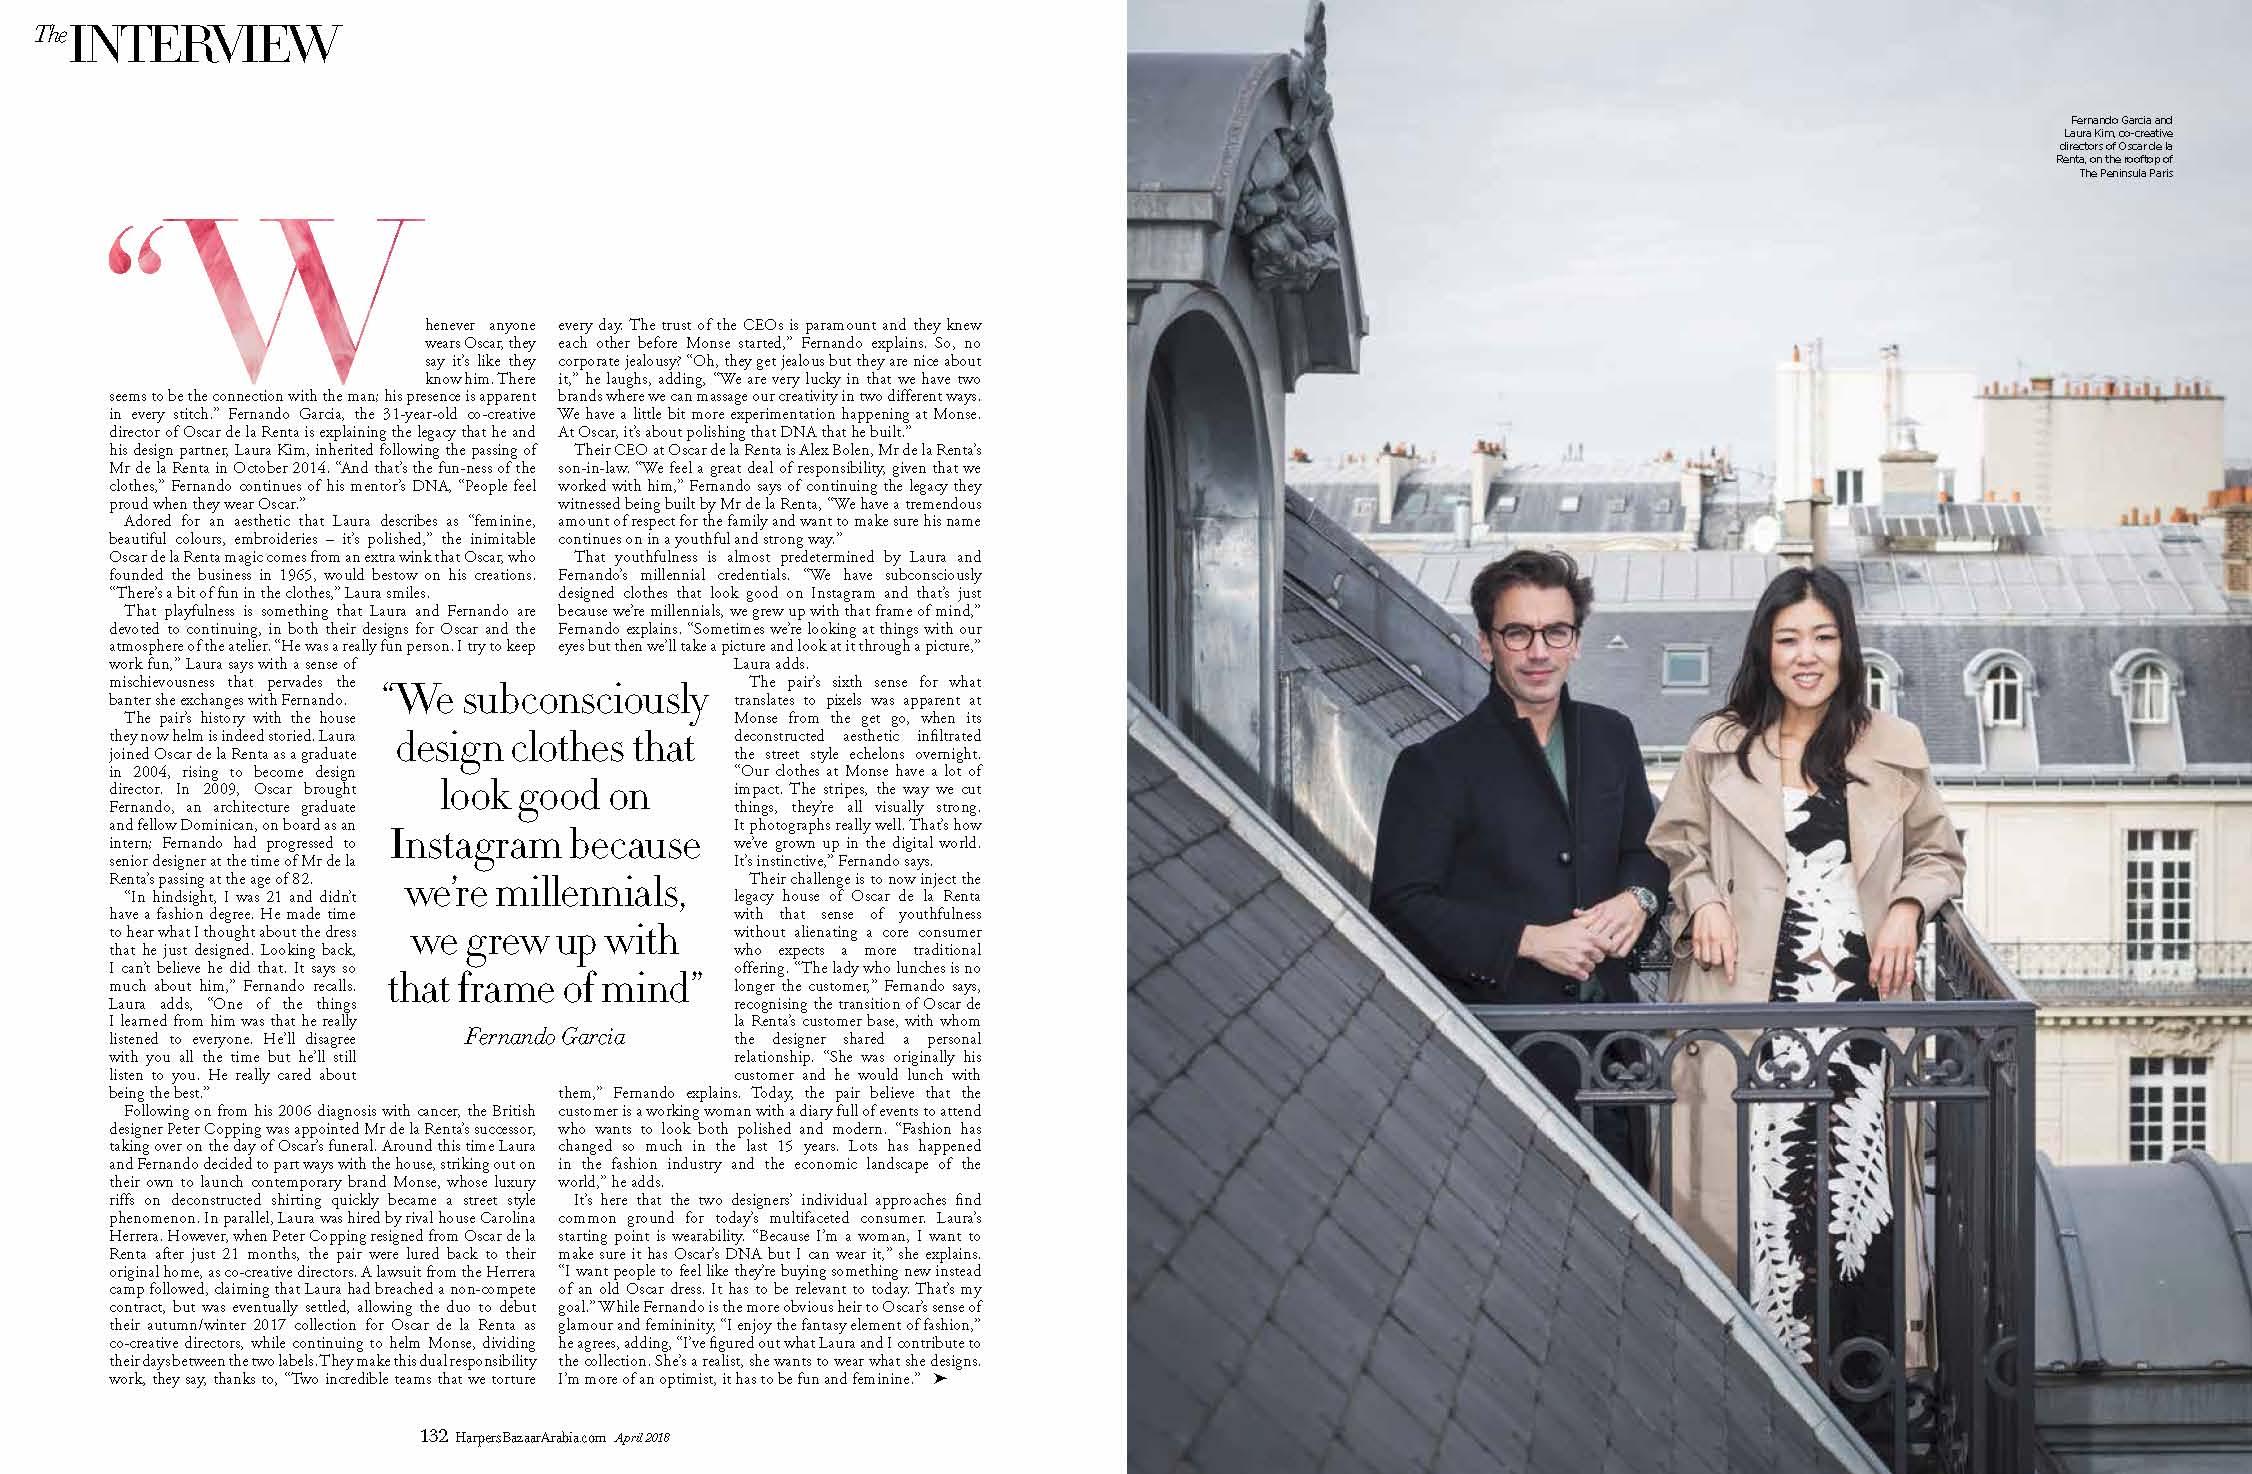 Laura Kim and Fernando Garcia, April 2018 2.jpg